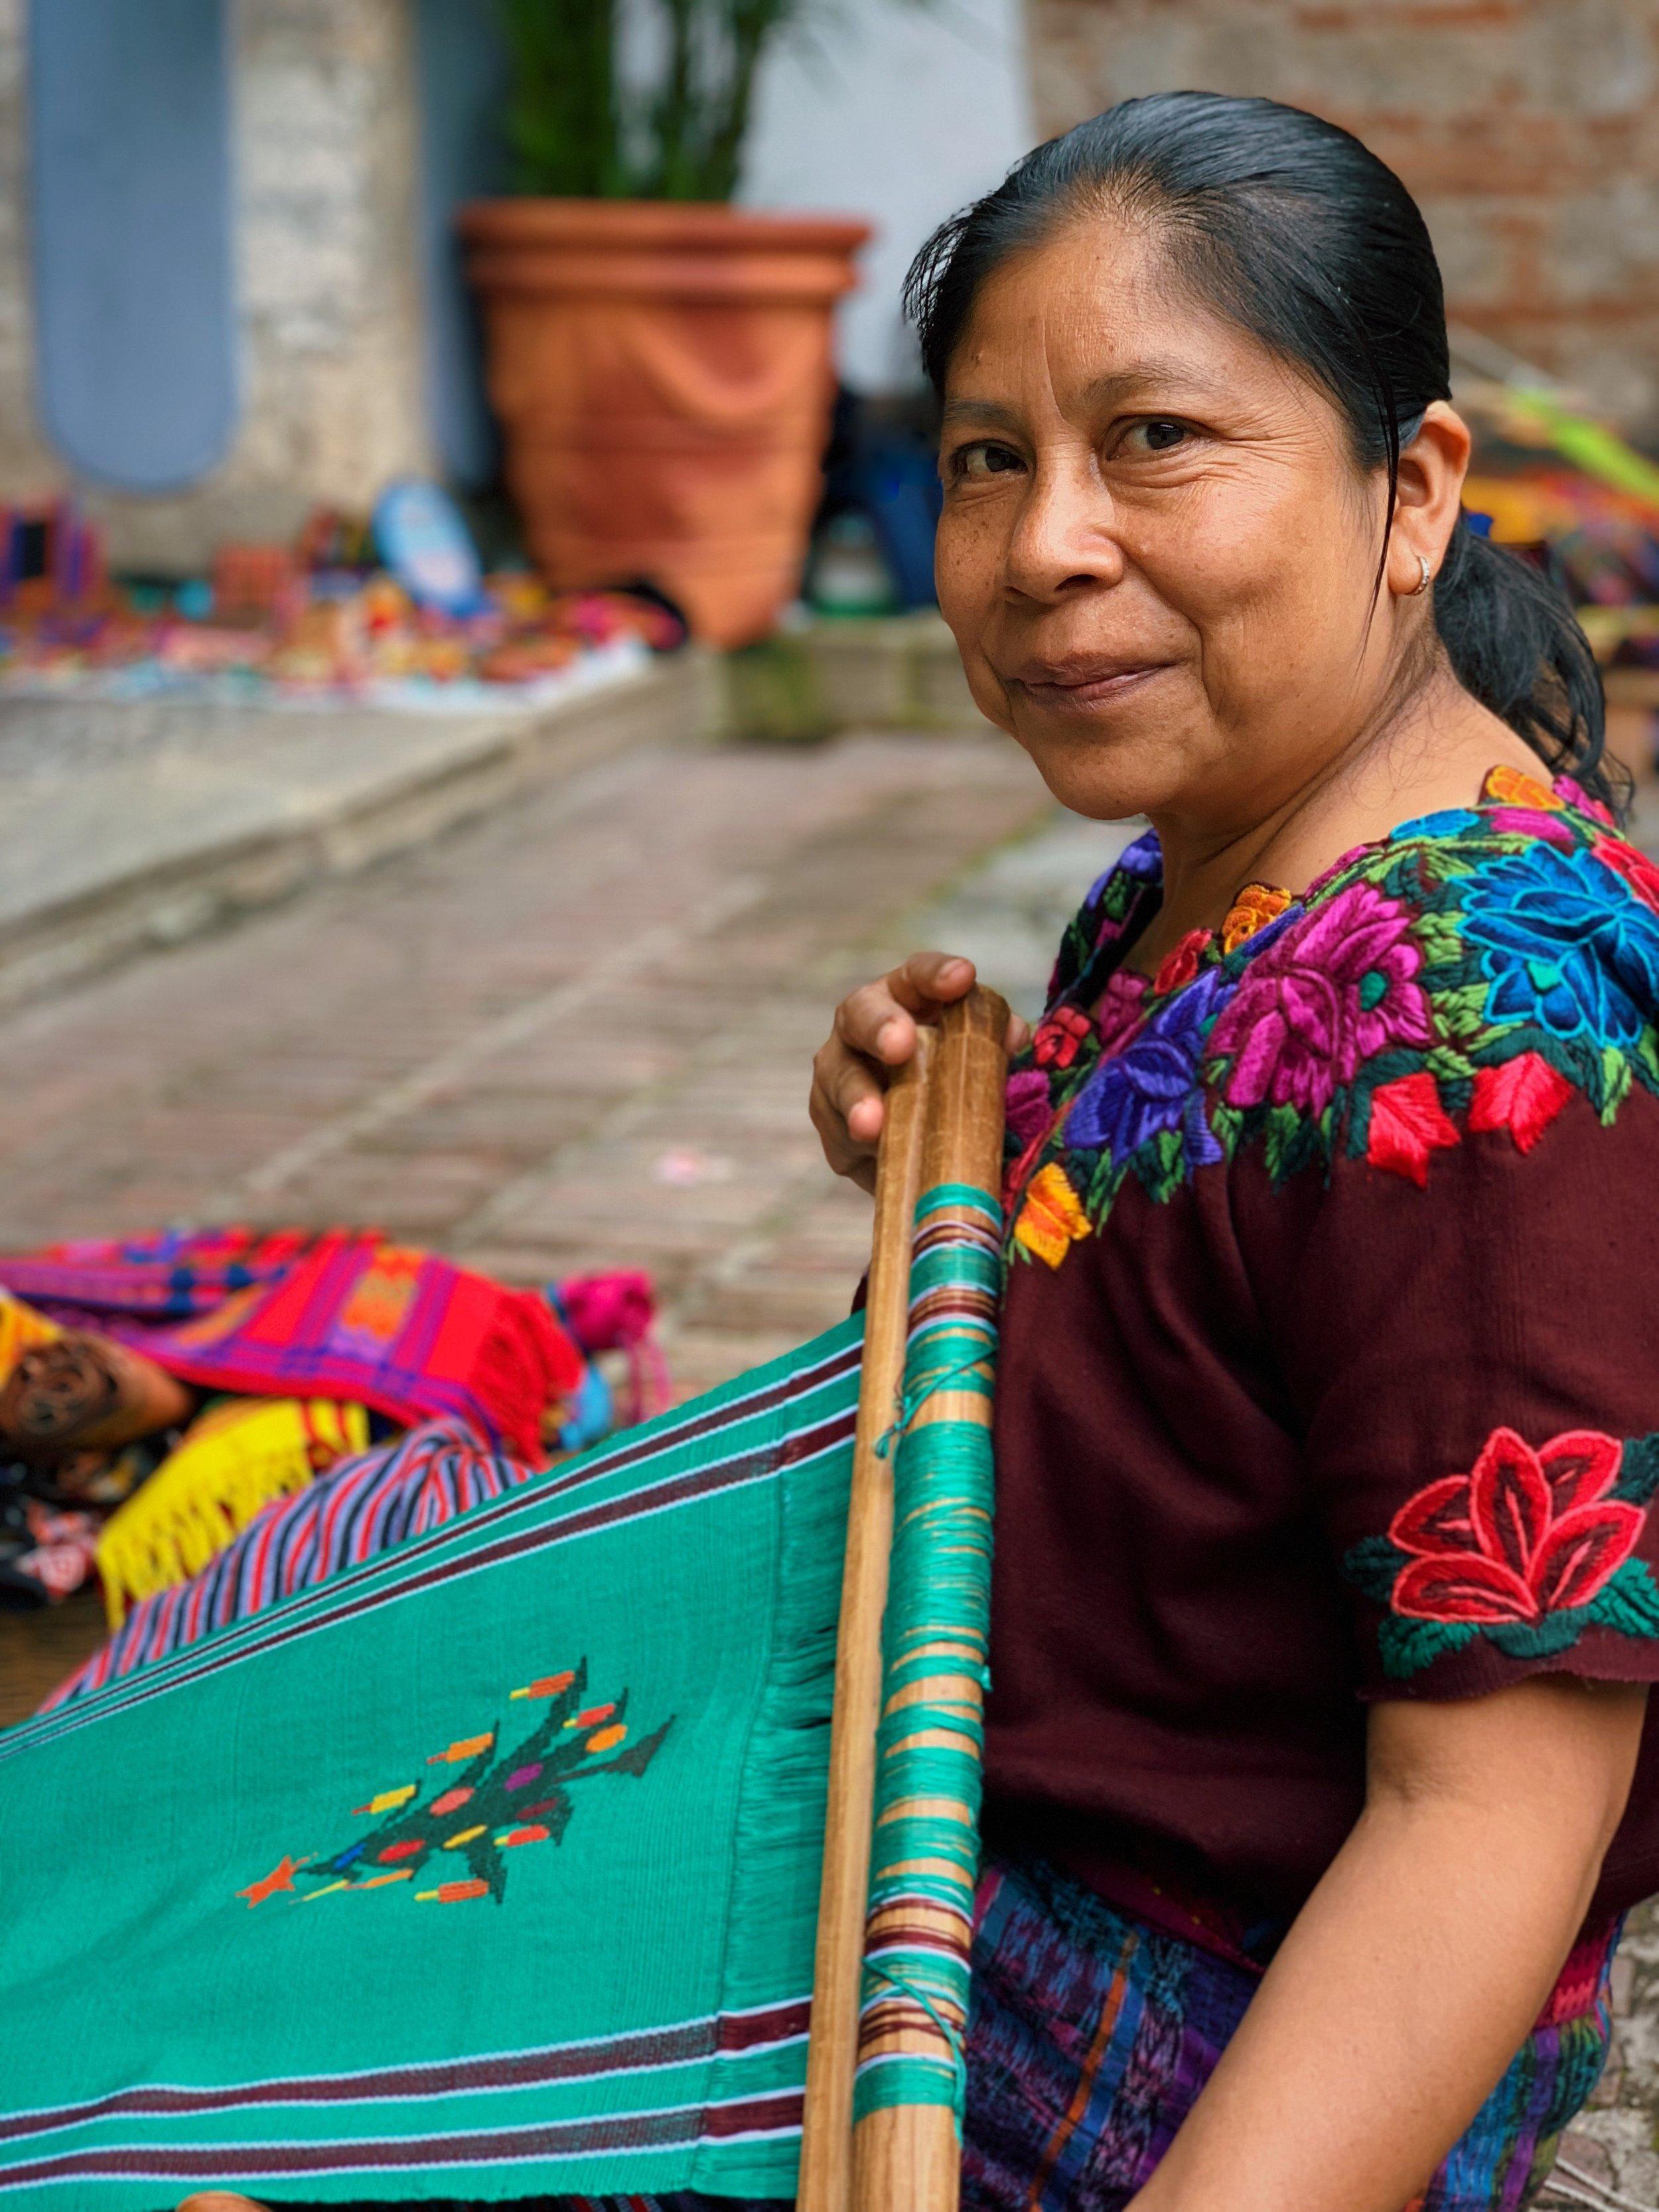 Guatemala Artisans Captured by Artizenry